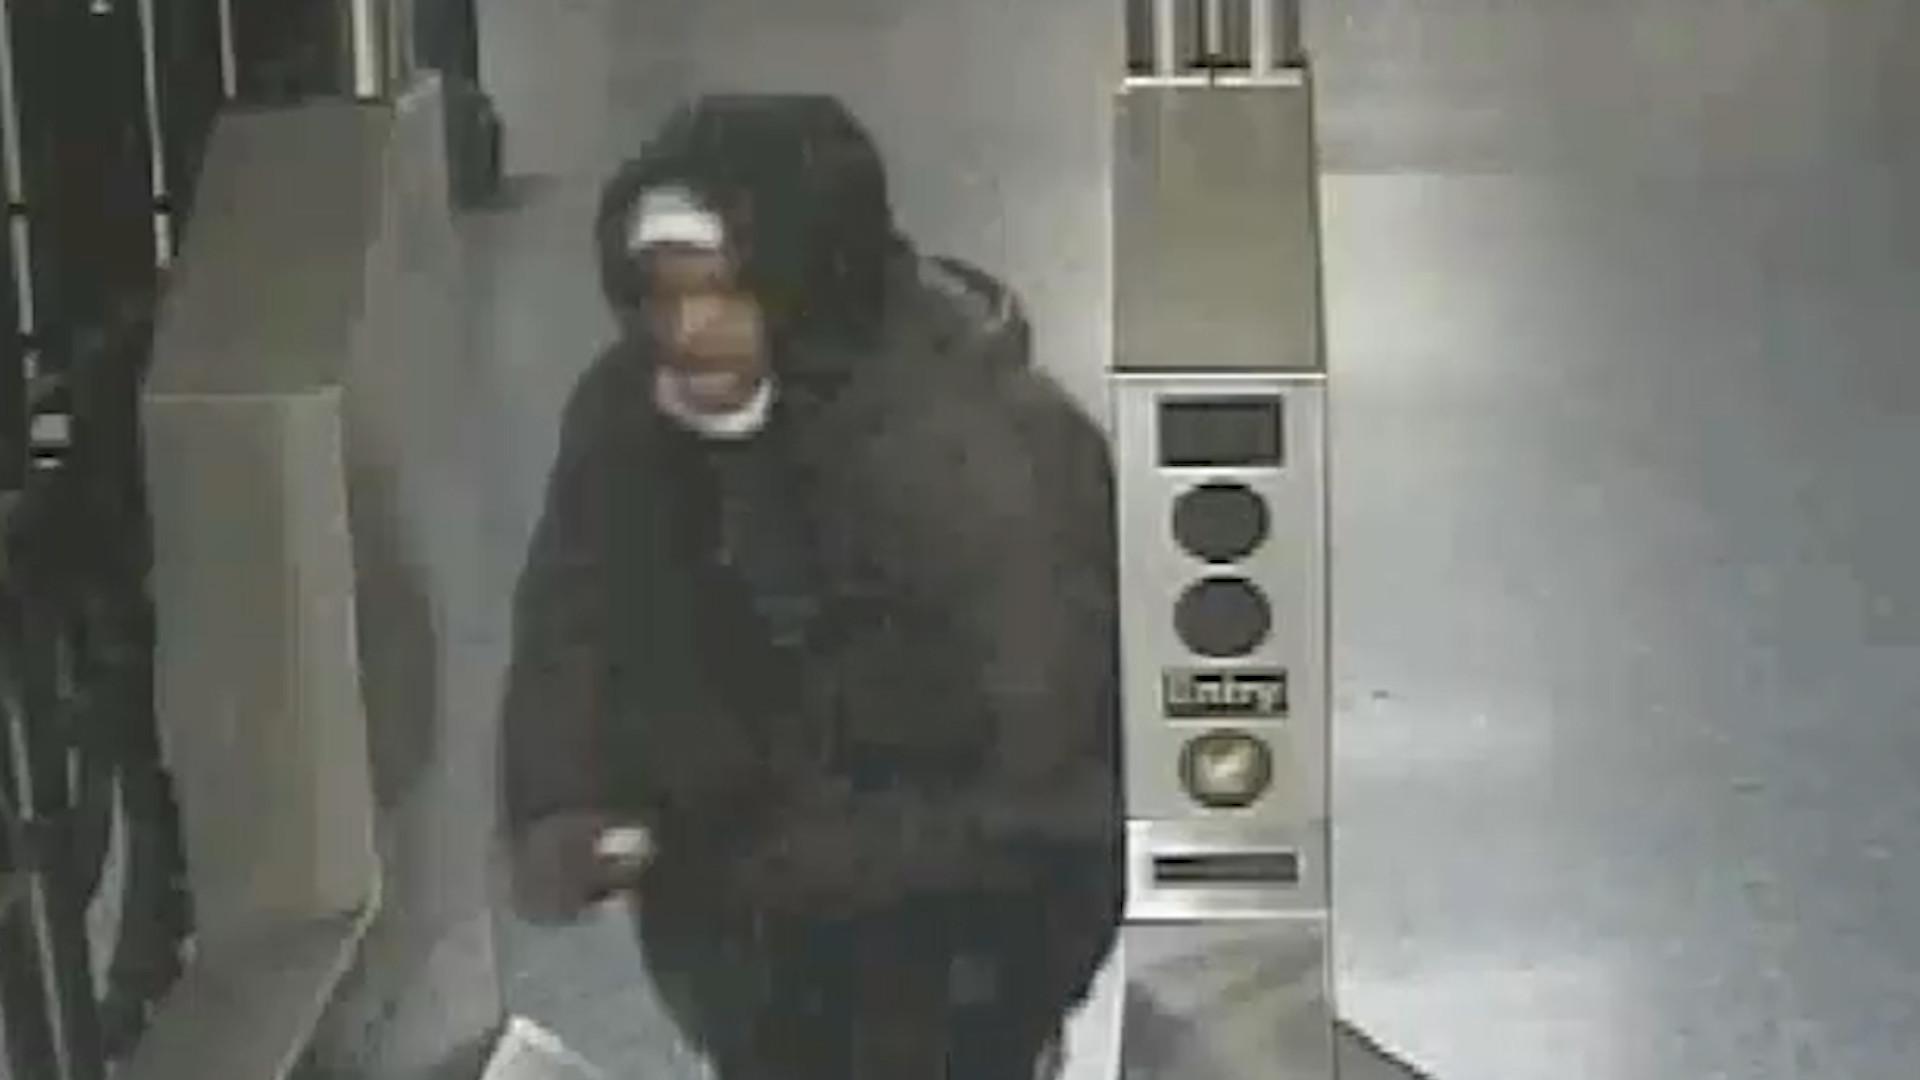 Chain of fools: Wacko throws bike chain onto NYC subway train, hitting off-duty cop